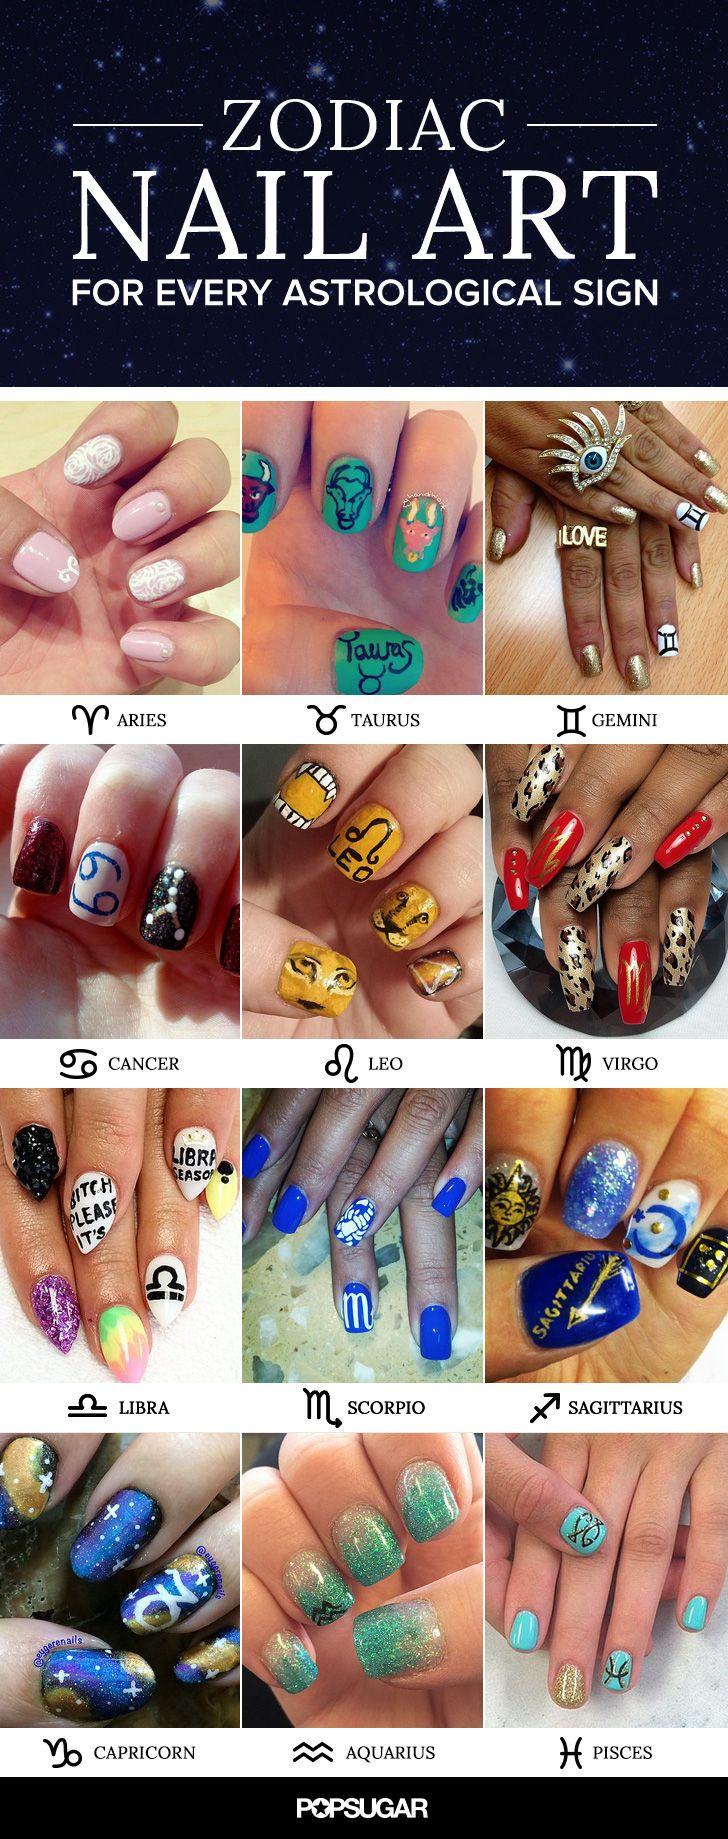 Zodiac Nail Art Ideas That Are More Spiritual Than Your Horoscope Zodiac Nail Designs Nail Art Zodiac Signs Stylish Nails Art